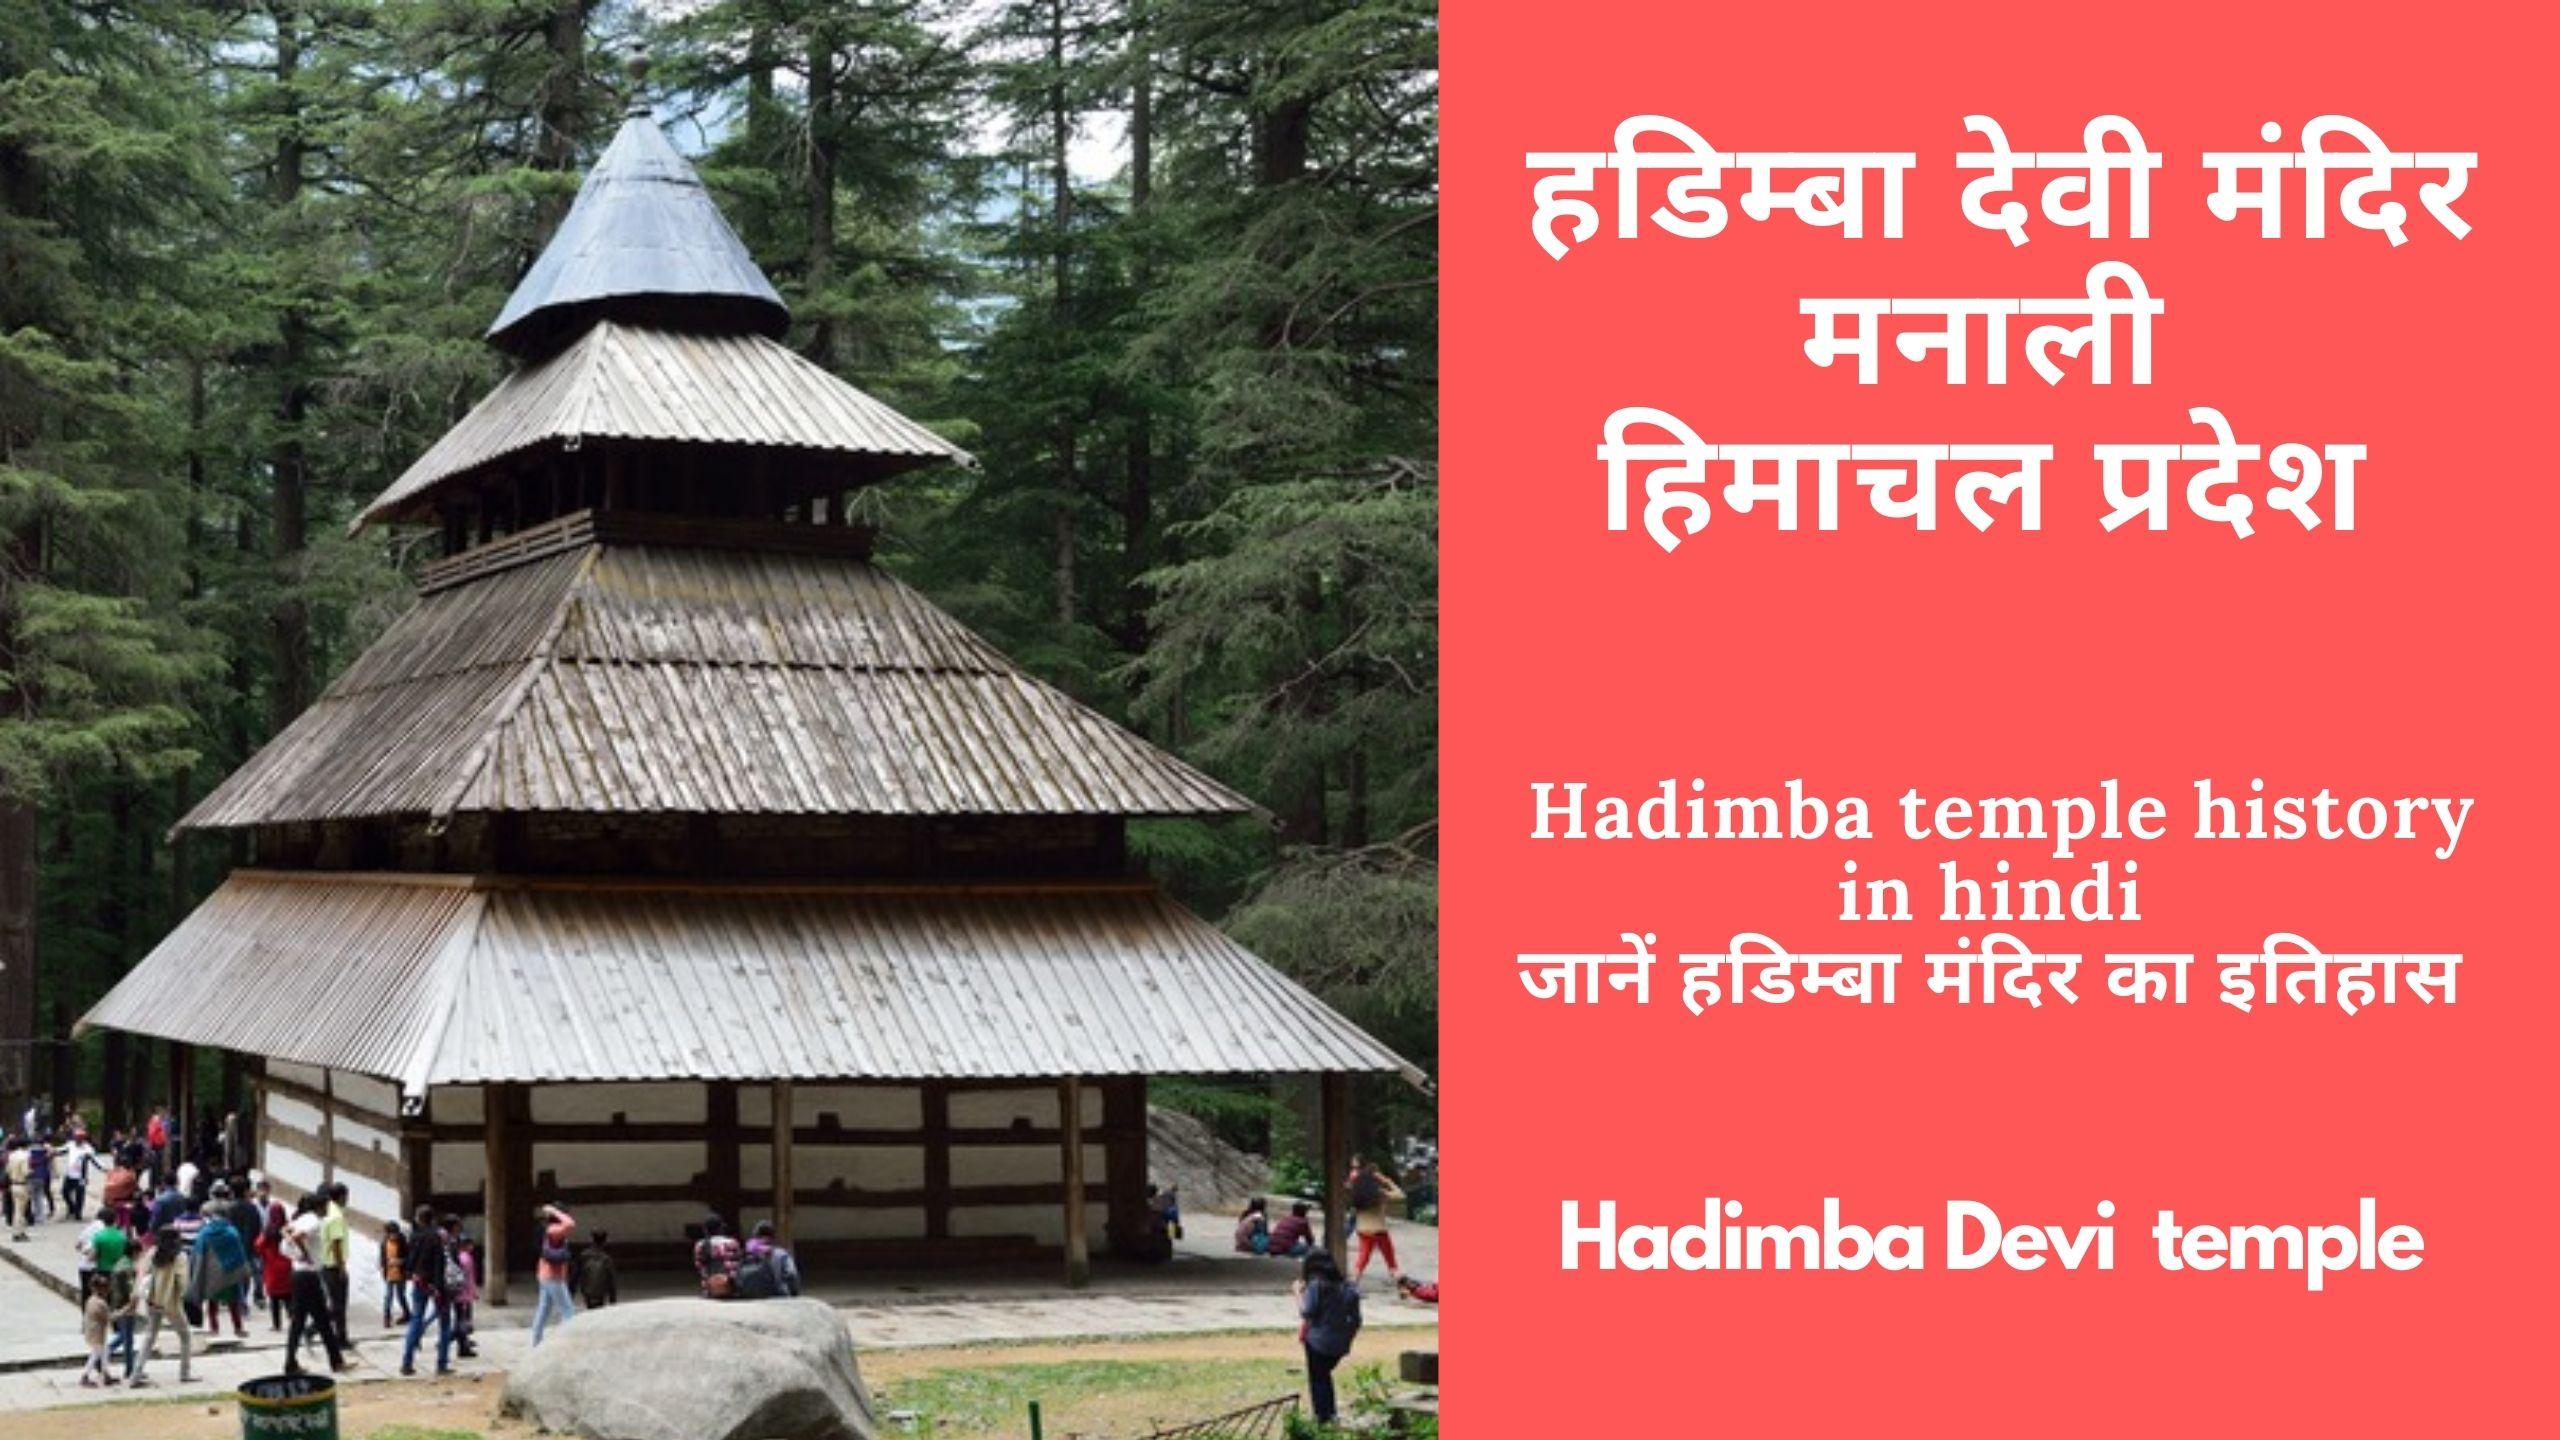 Hadimba temple history in hindi